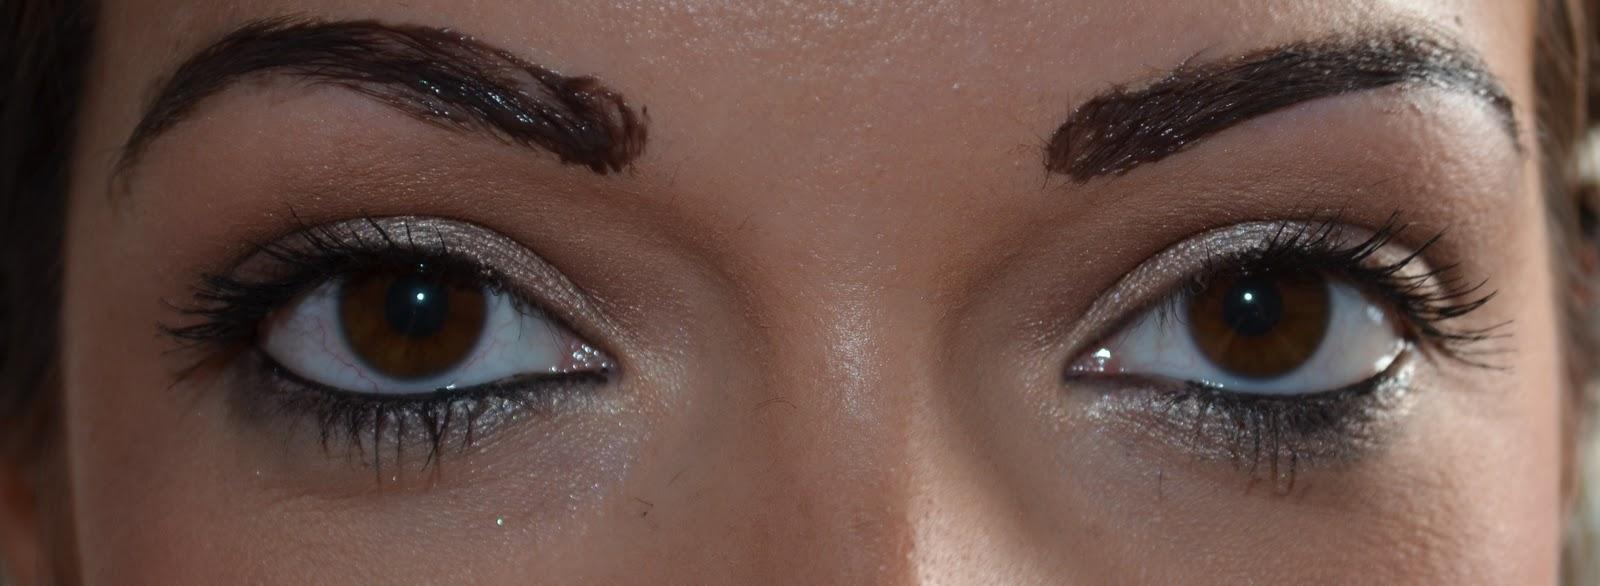 Diy eyebrow tinting dizzybrunette my eyebrows with the dye on solutioingenieria Gallery